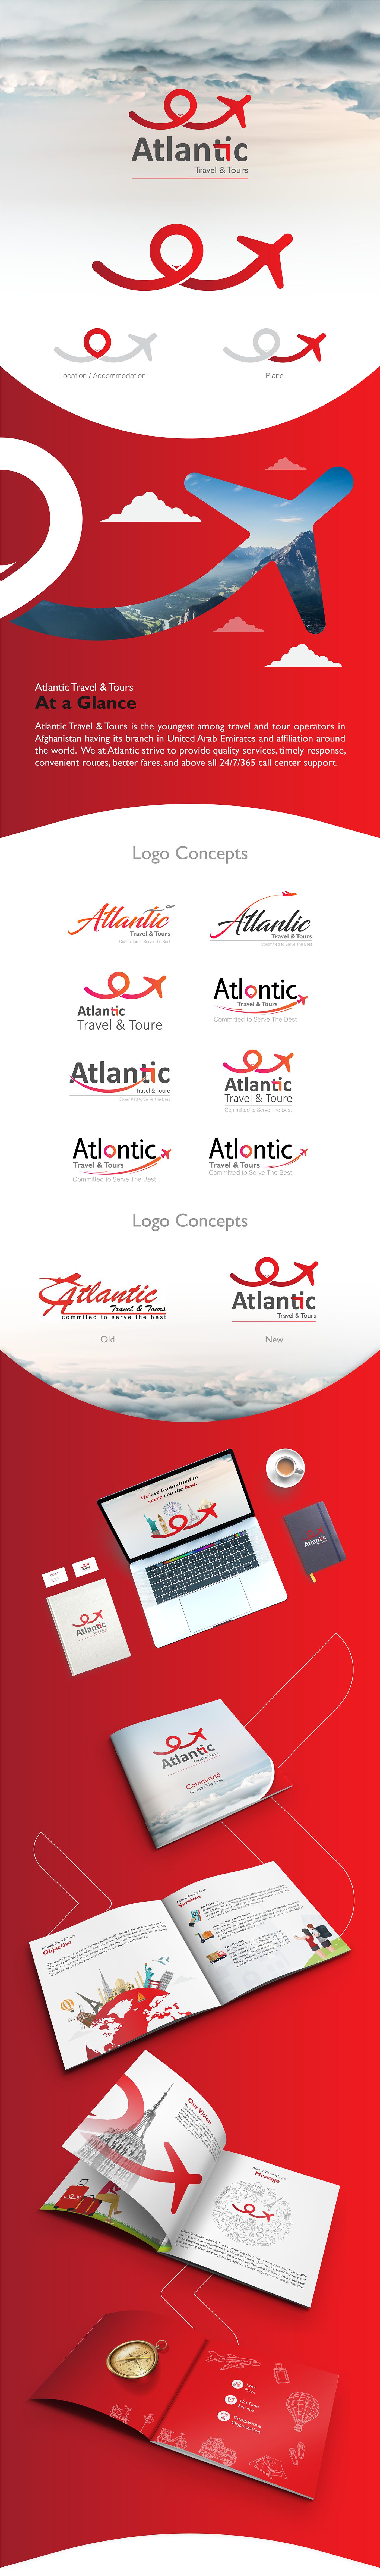 Corporate Identity,branding ,Travel,kabul,Afghanistan,graphic design ,flat design,Logo Design